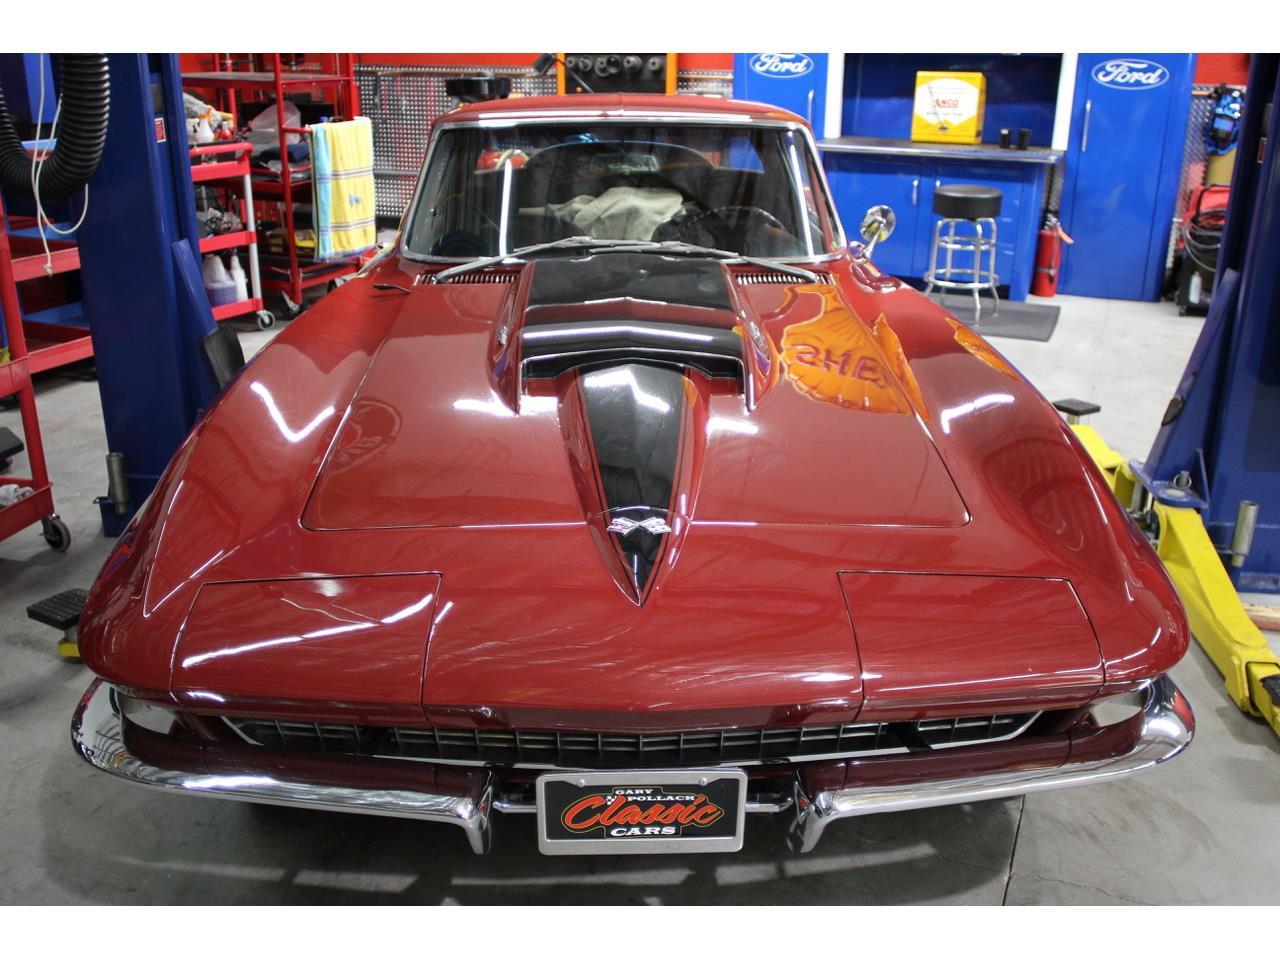 1967 Chevrolet Corvette (CC-1415661) for sale in Redwood City, California